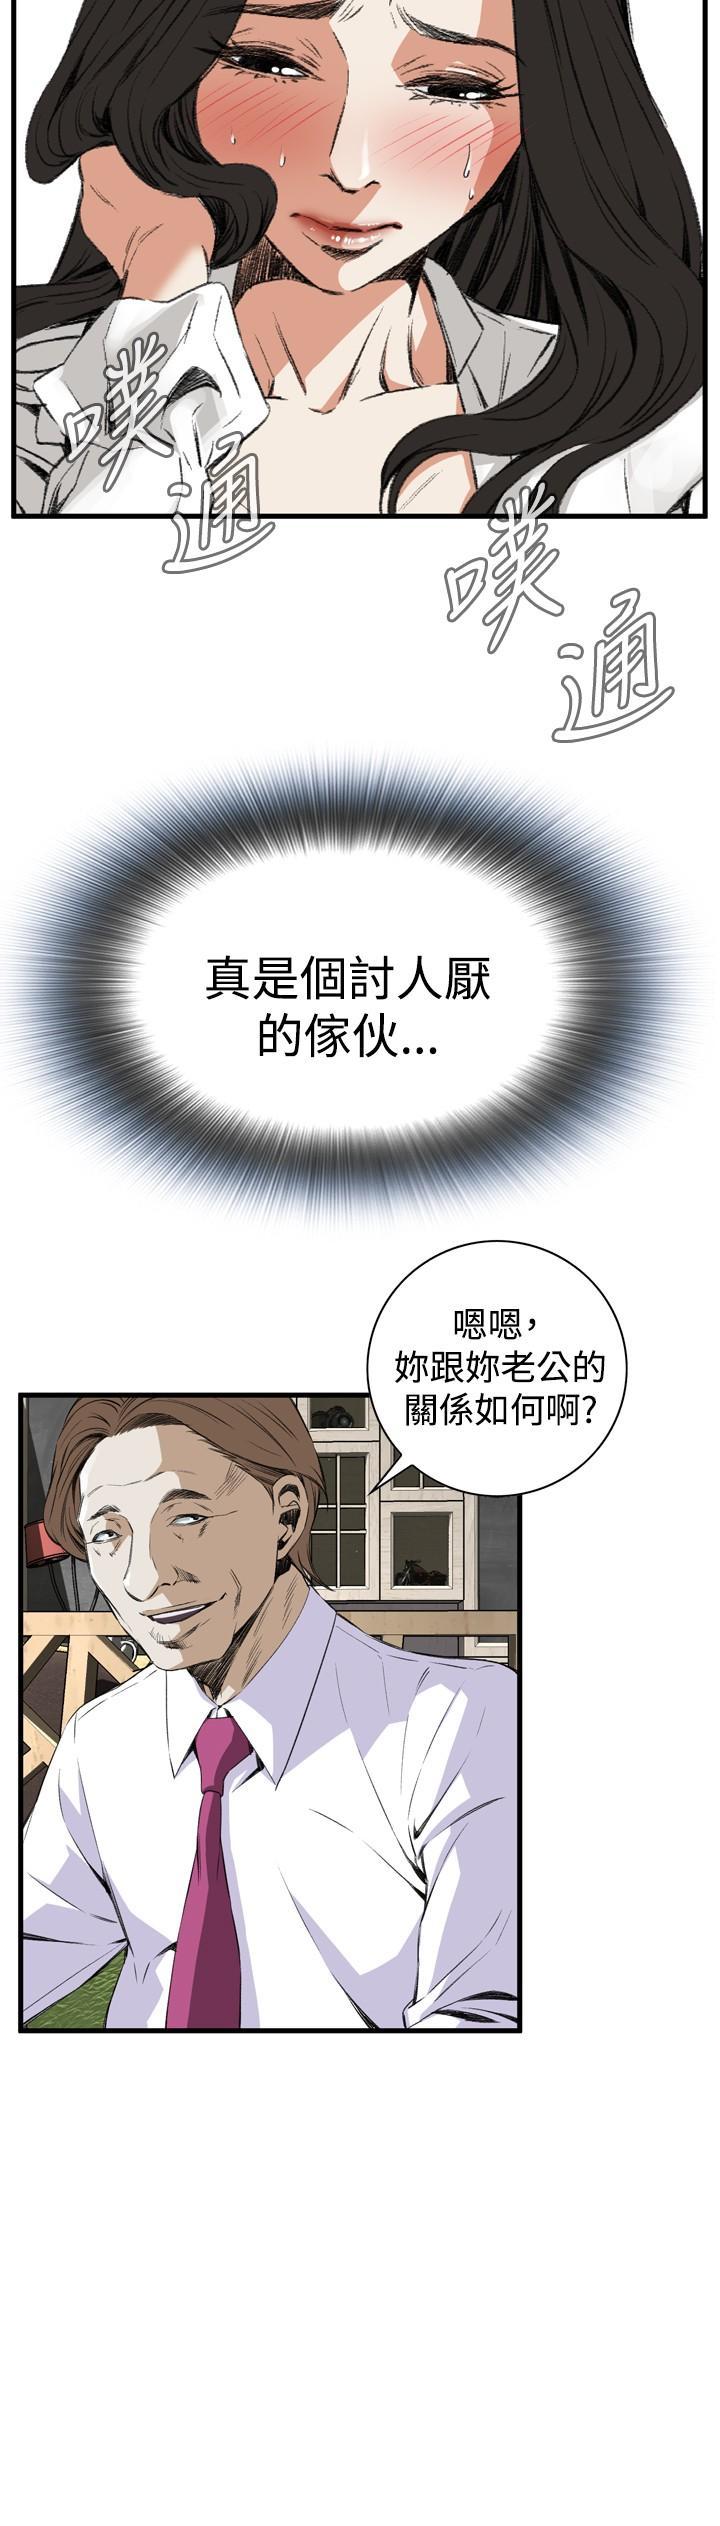 Take a Peek 偷窥 Ch.39~51 [Chinese]中文 263